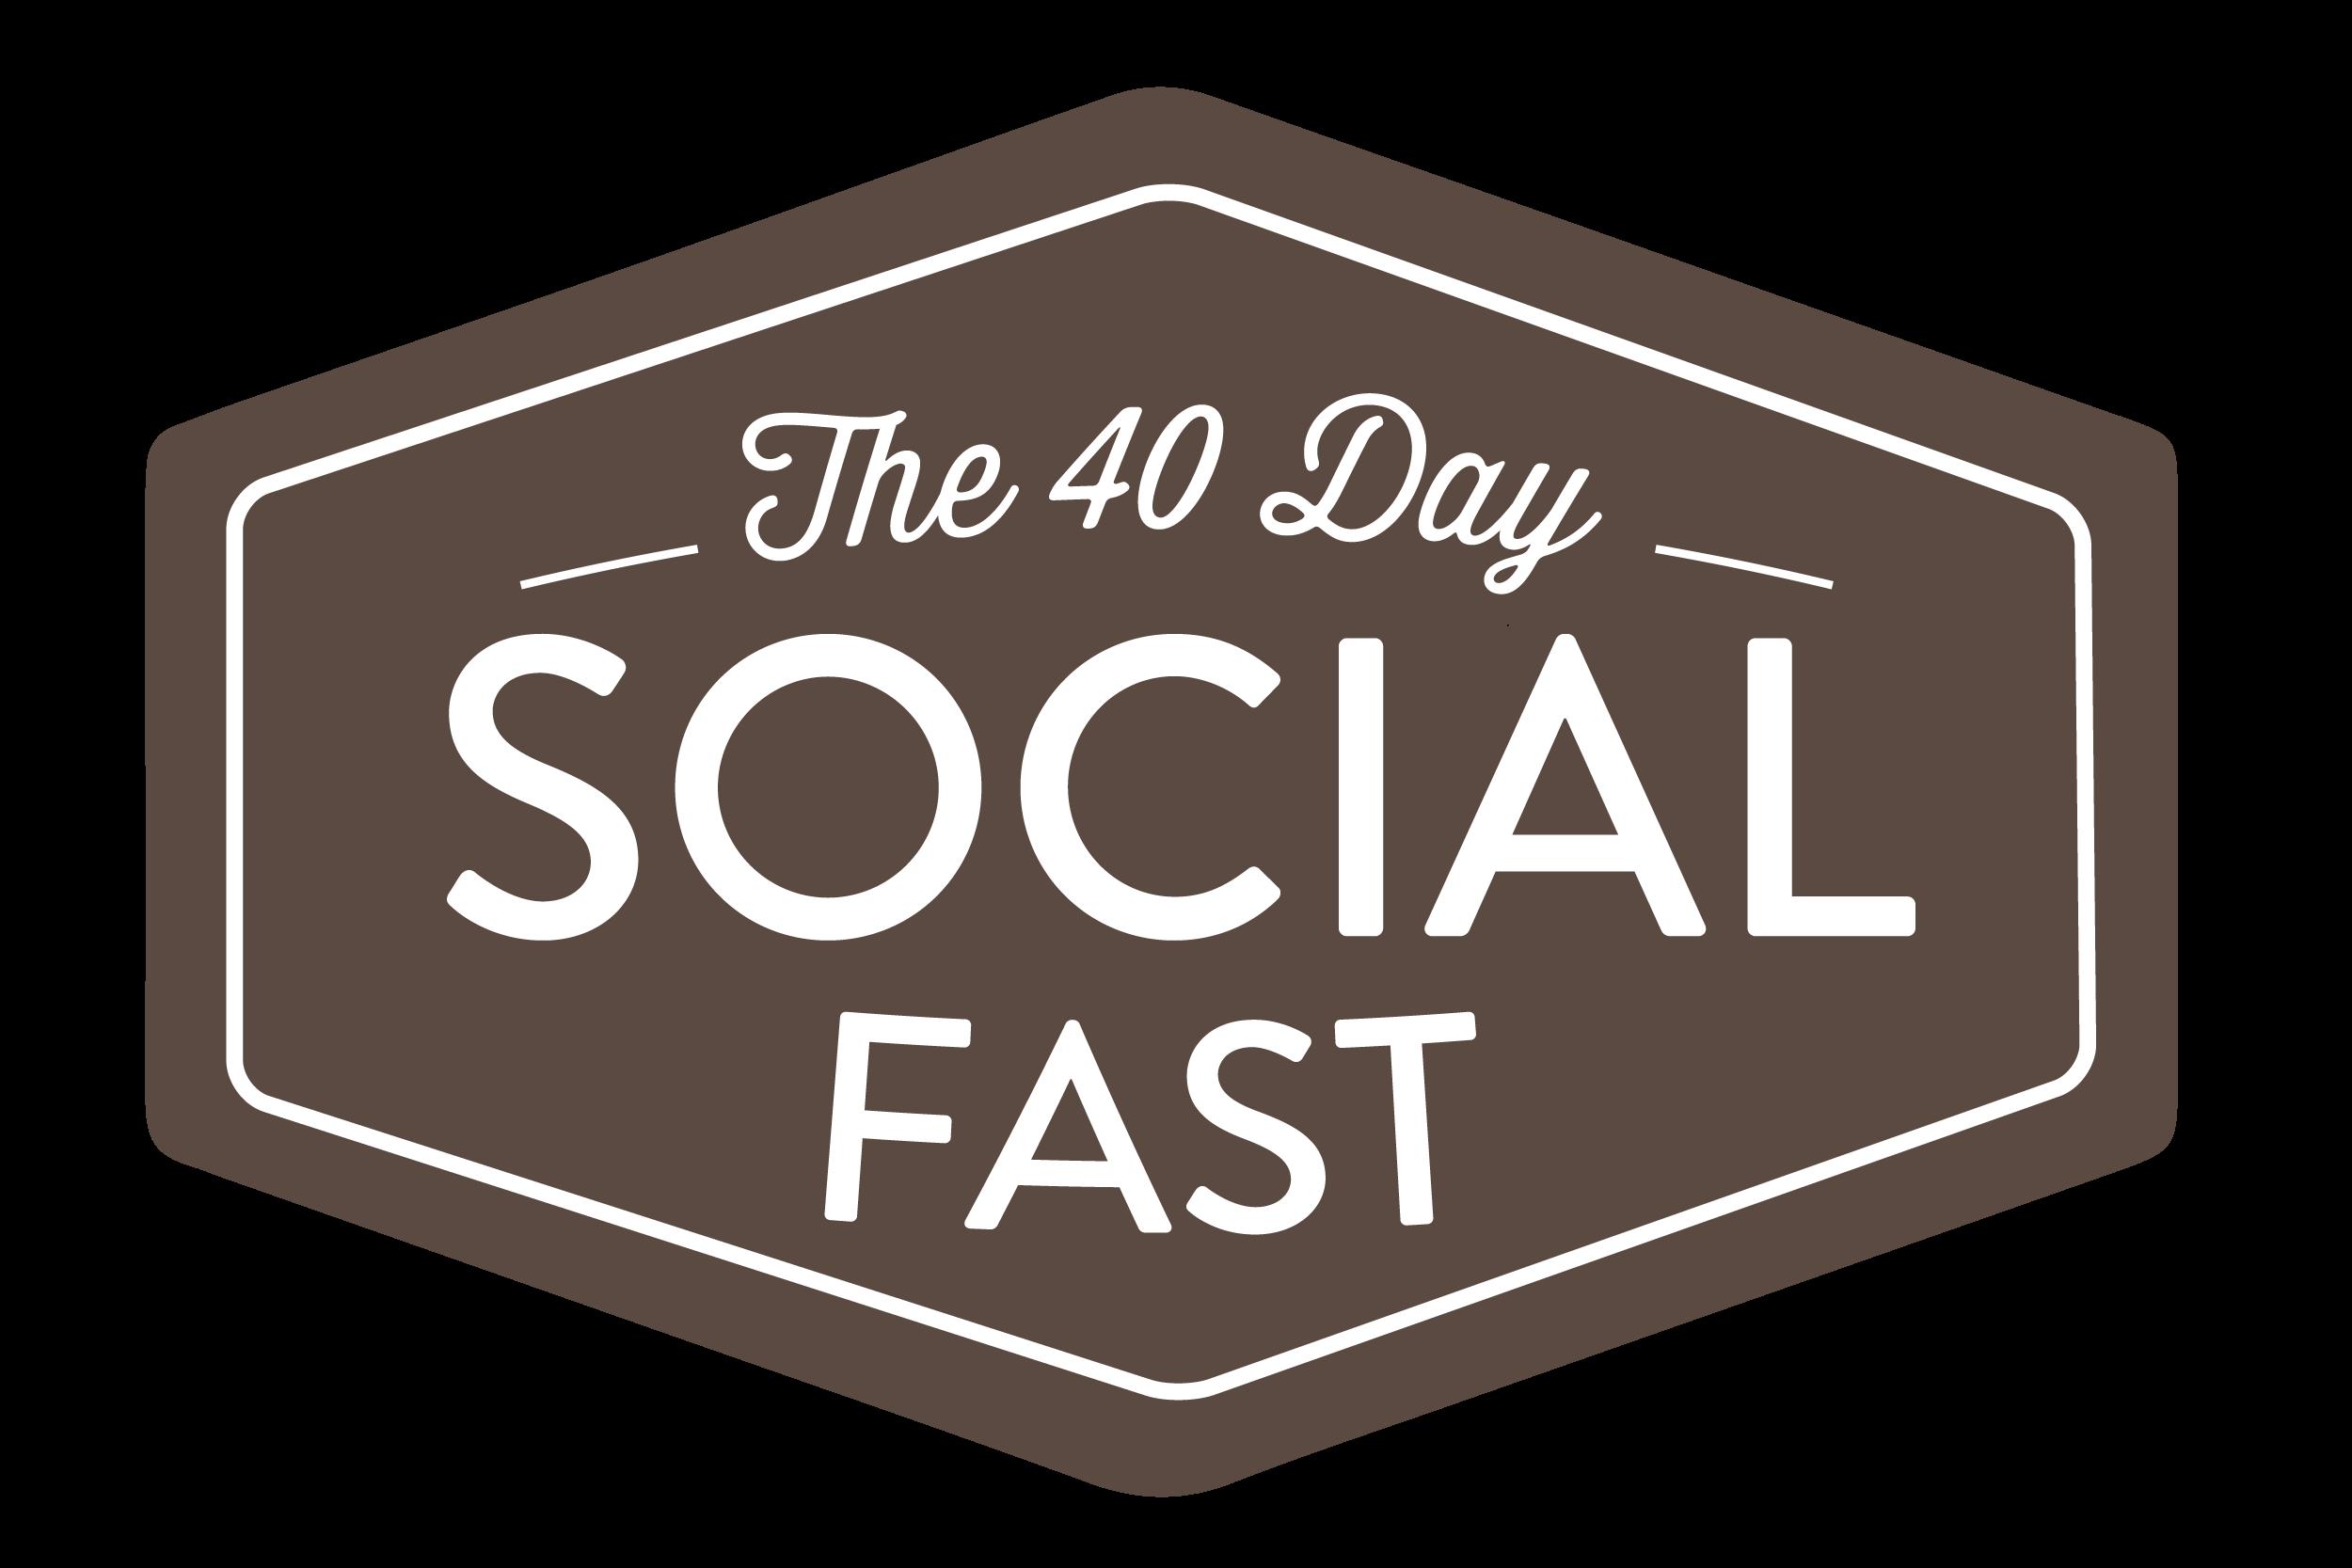 socialfast-logo-2019.png